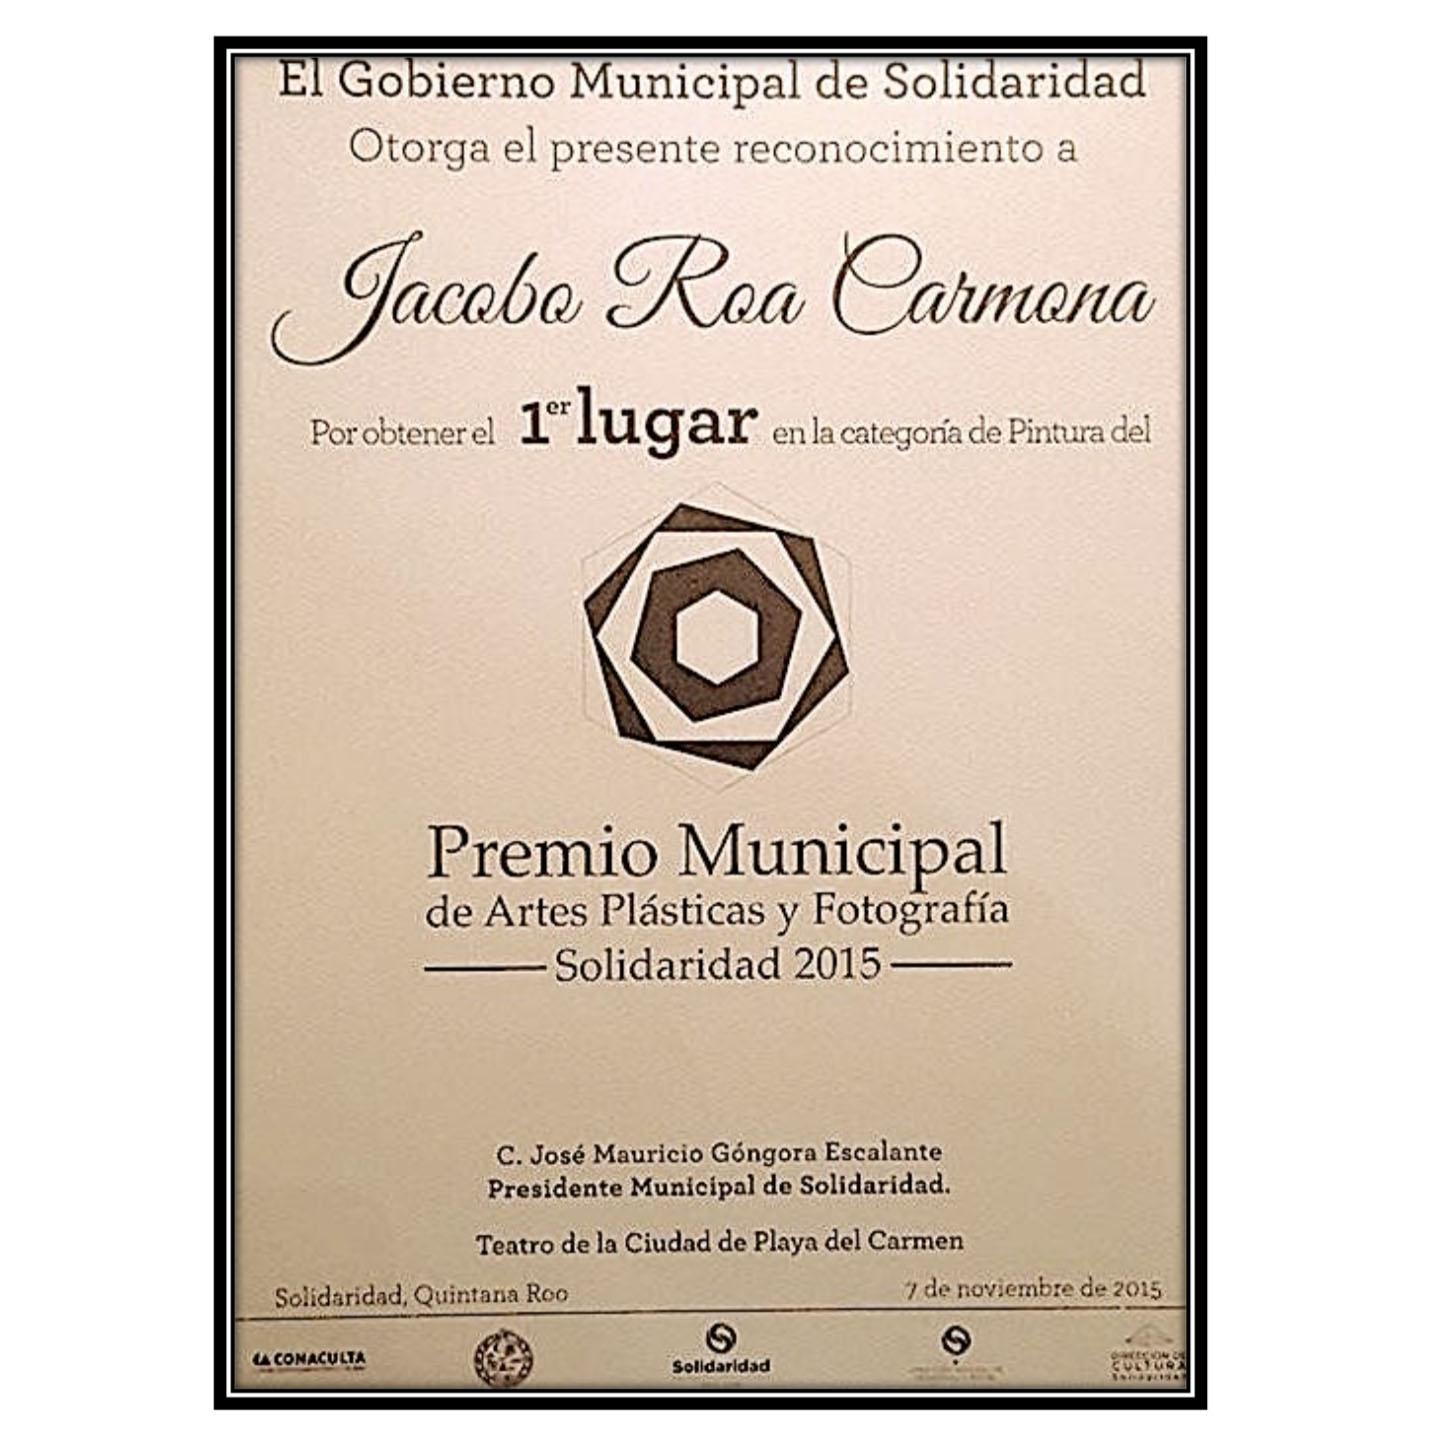 Jacobo Roa Premio Municipal 3.jpg